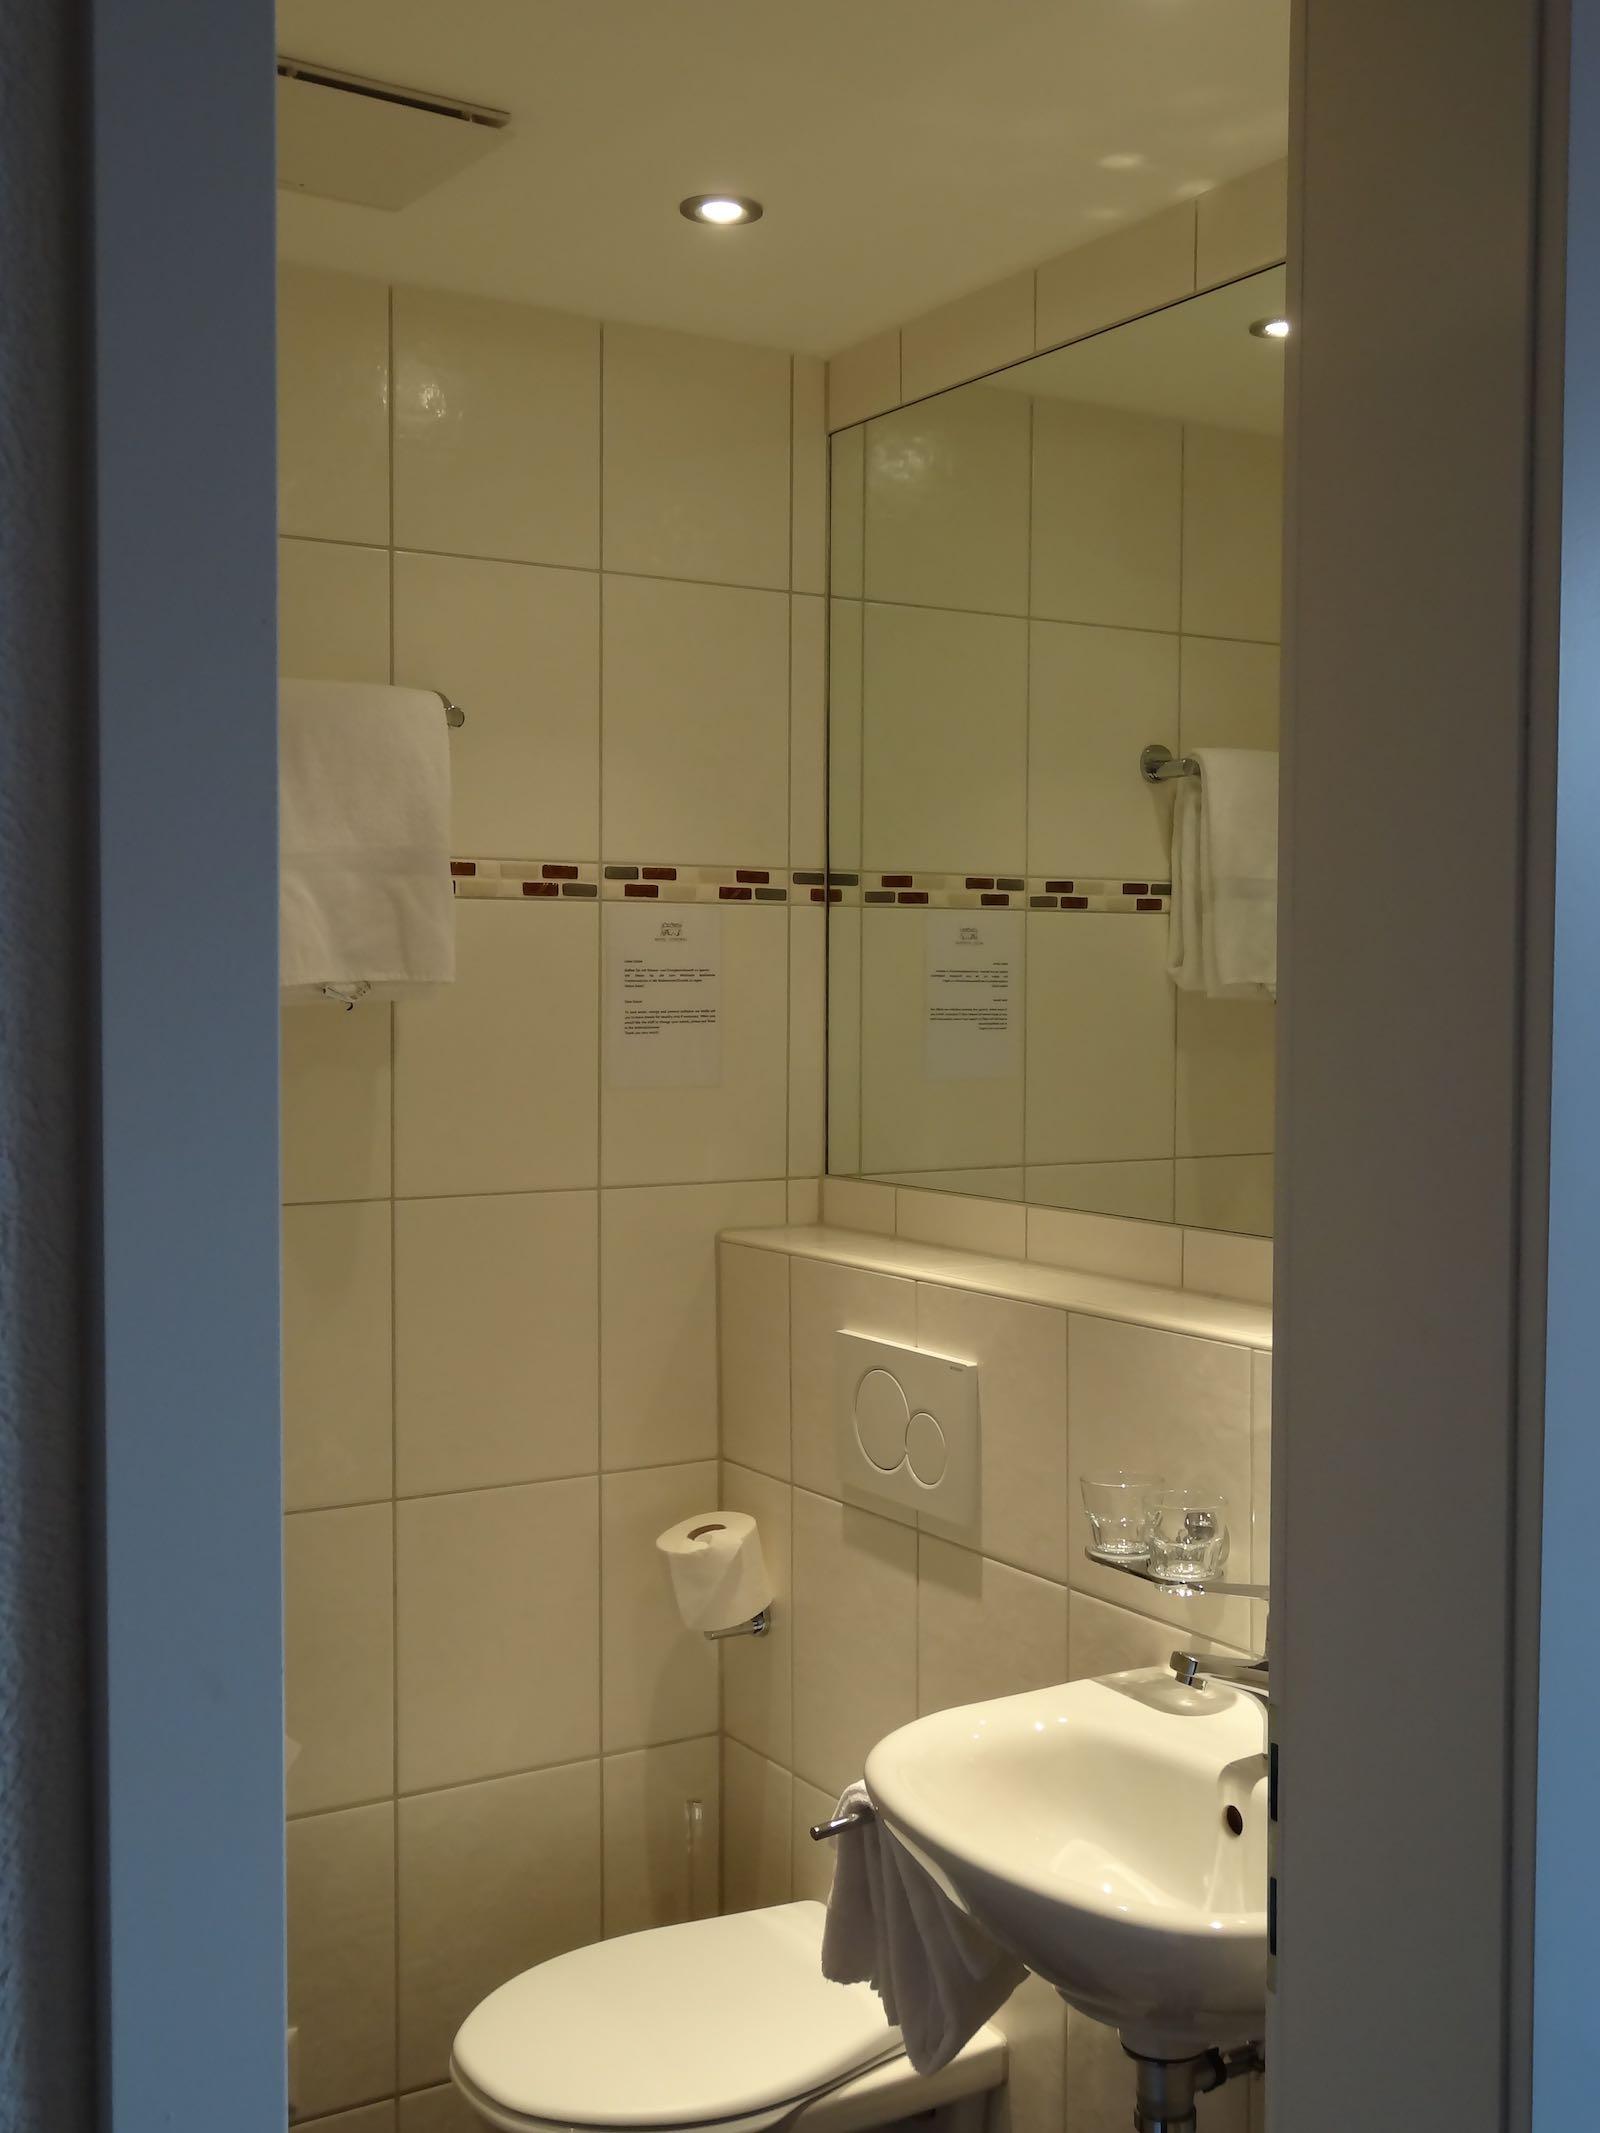 http://hoteljungfrau.ch/wp-content/uploads/2014/11/superior-zimmer-8.jpg